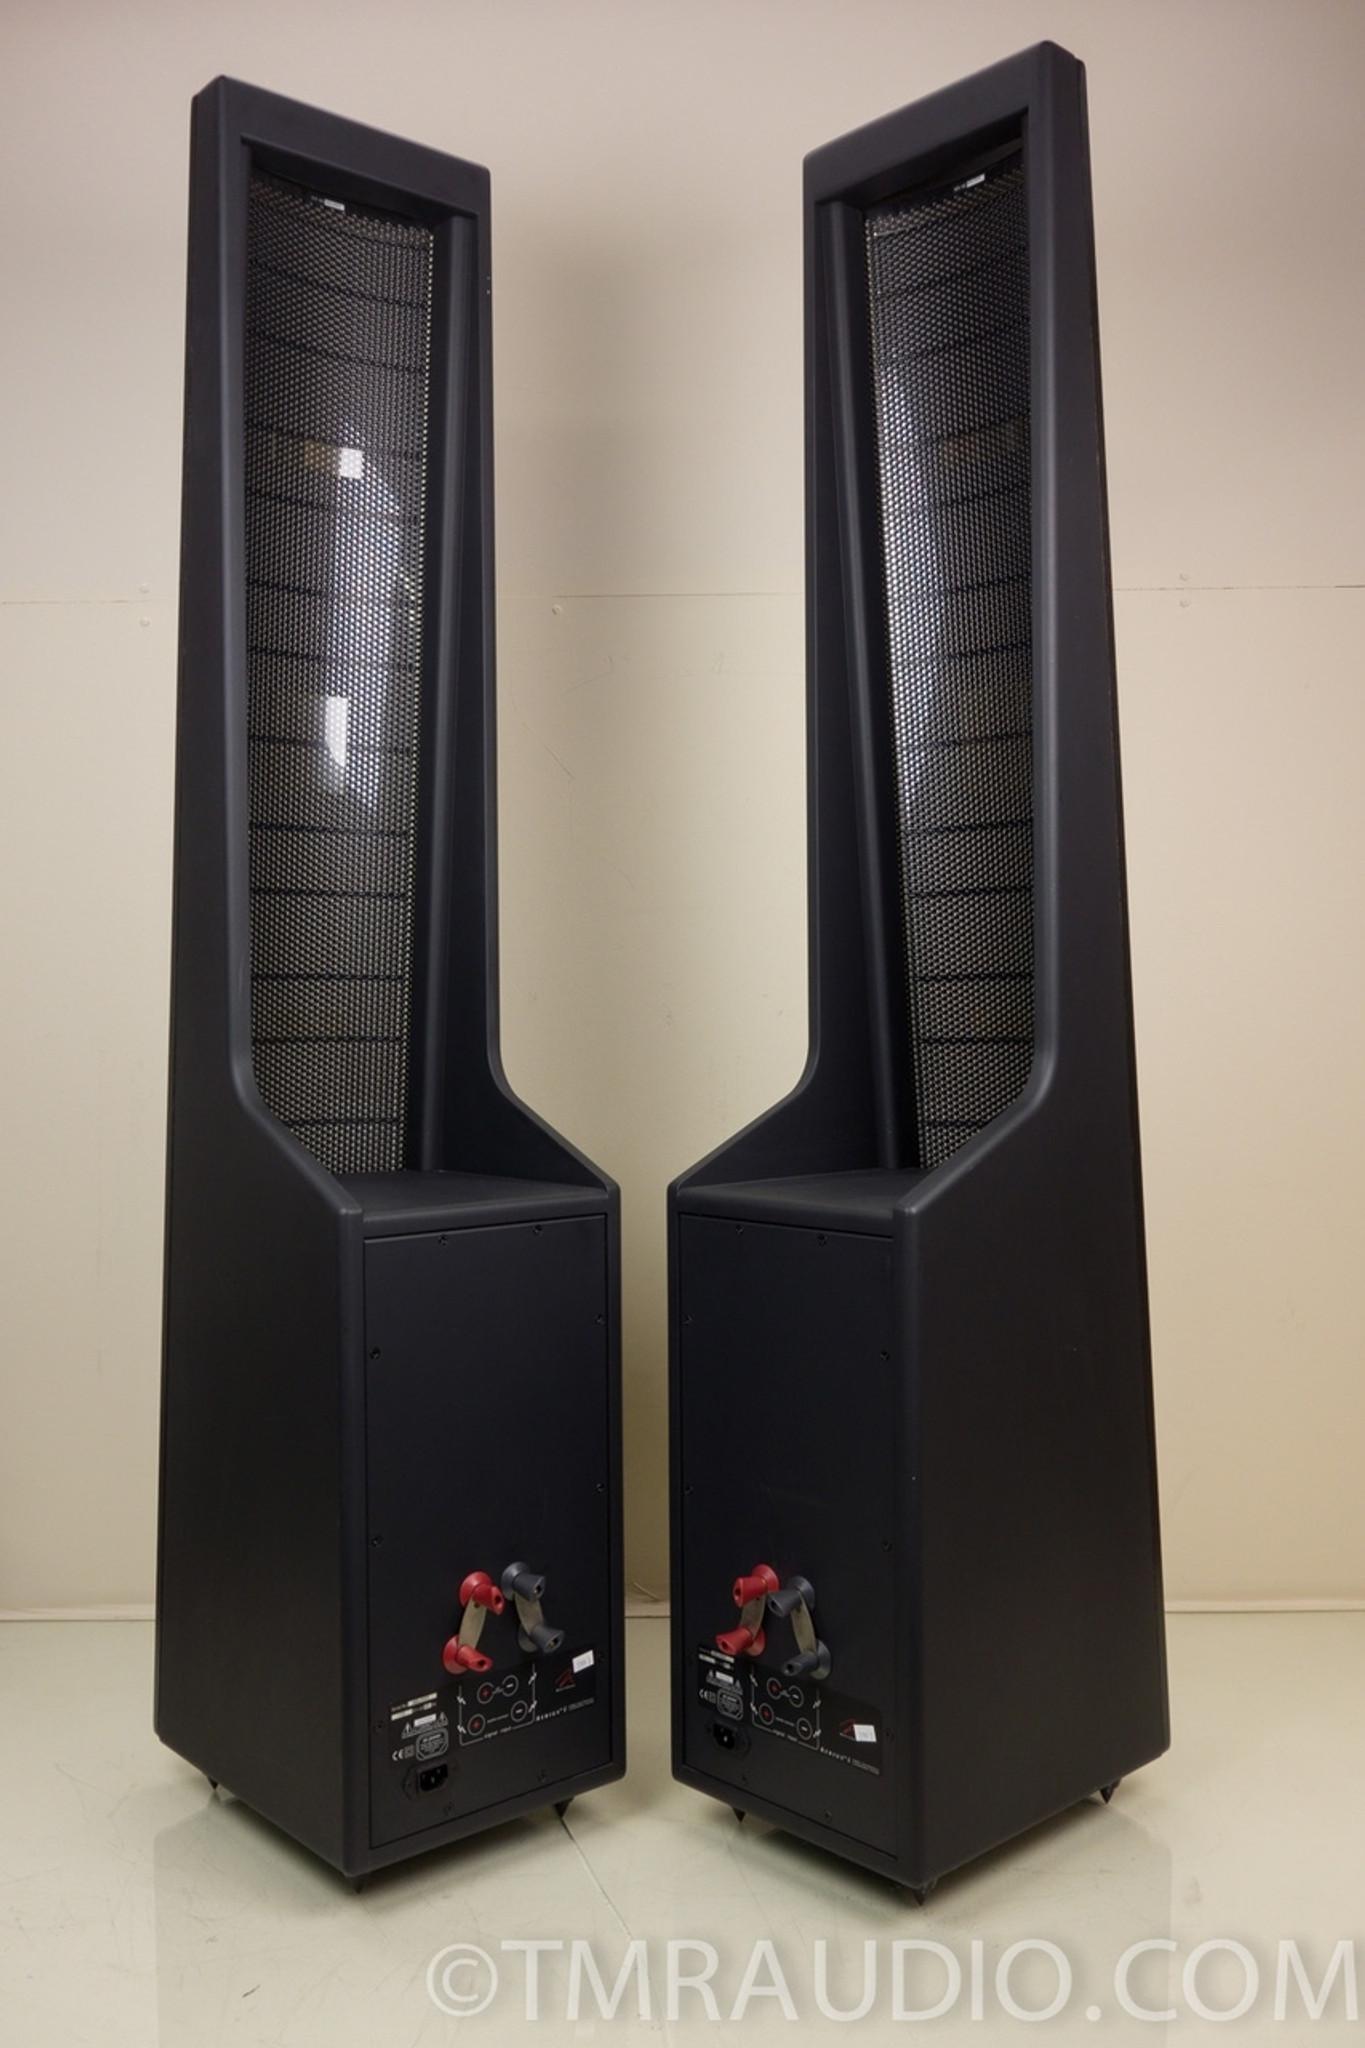 Martin Logan Aerius I Floorstanding Hybrid Speakers The